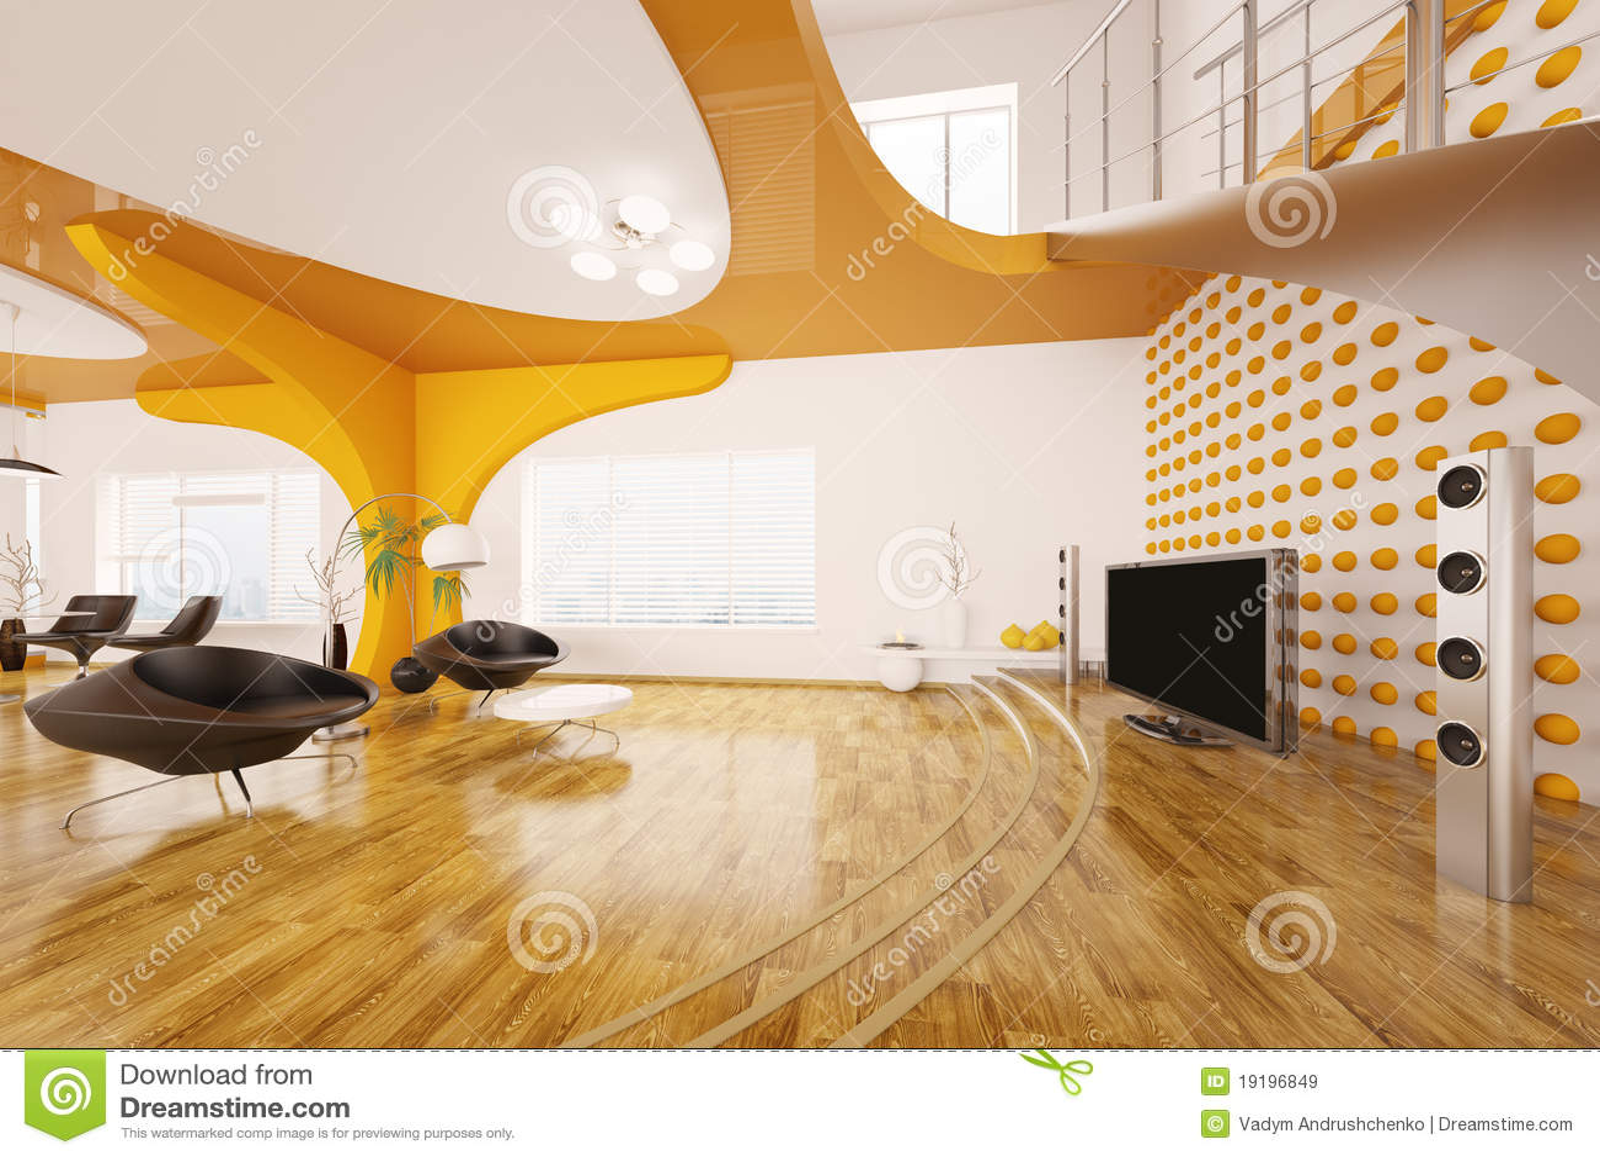 https://thumbs.dreamstime.com/z/het-moderne-binnenlandse-3d-ontwerp-van-woonkamer-geeft-terug-19196849.jpg